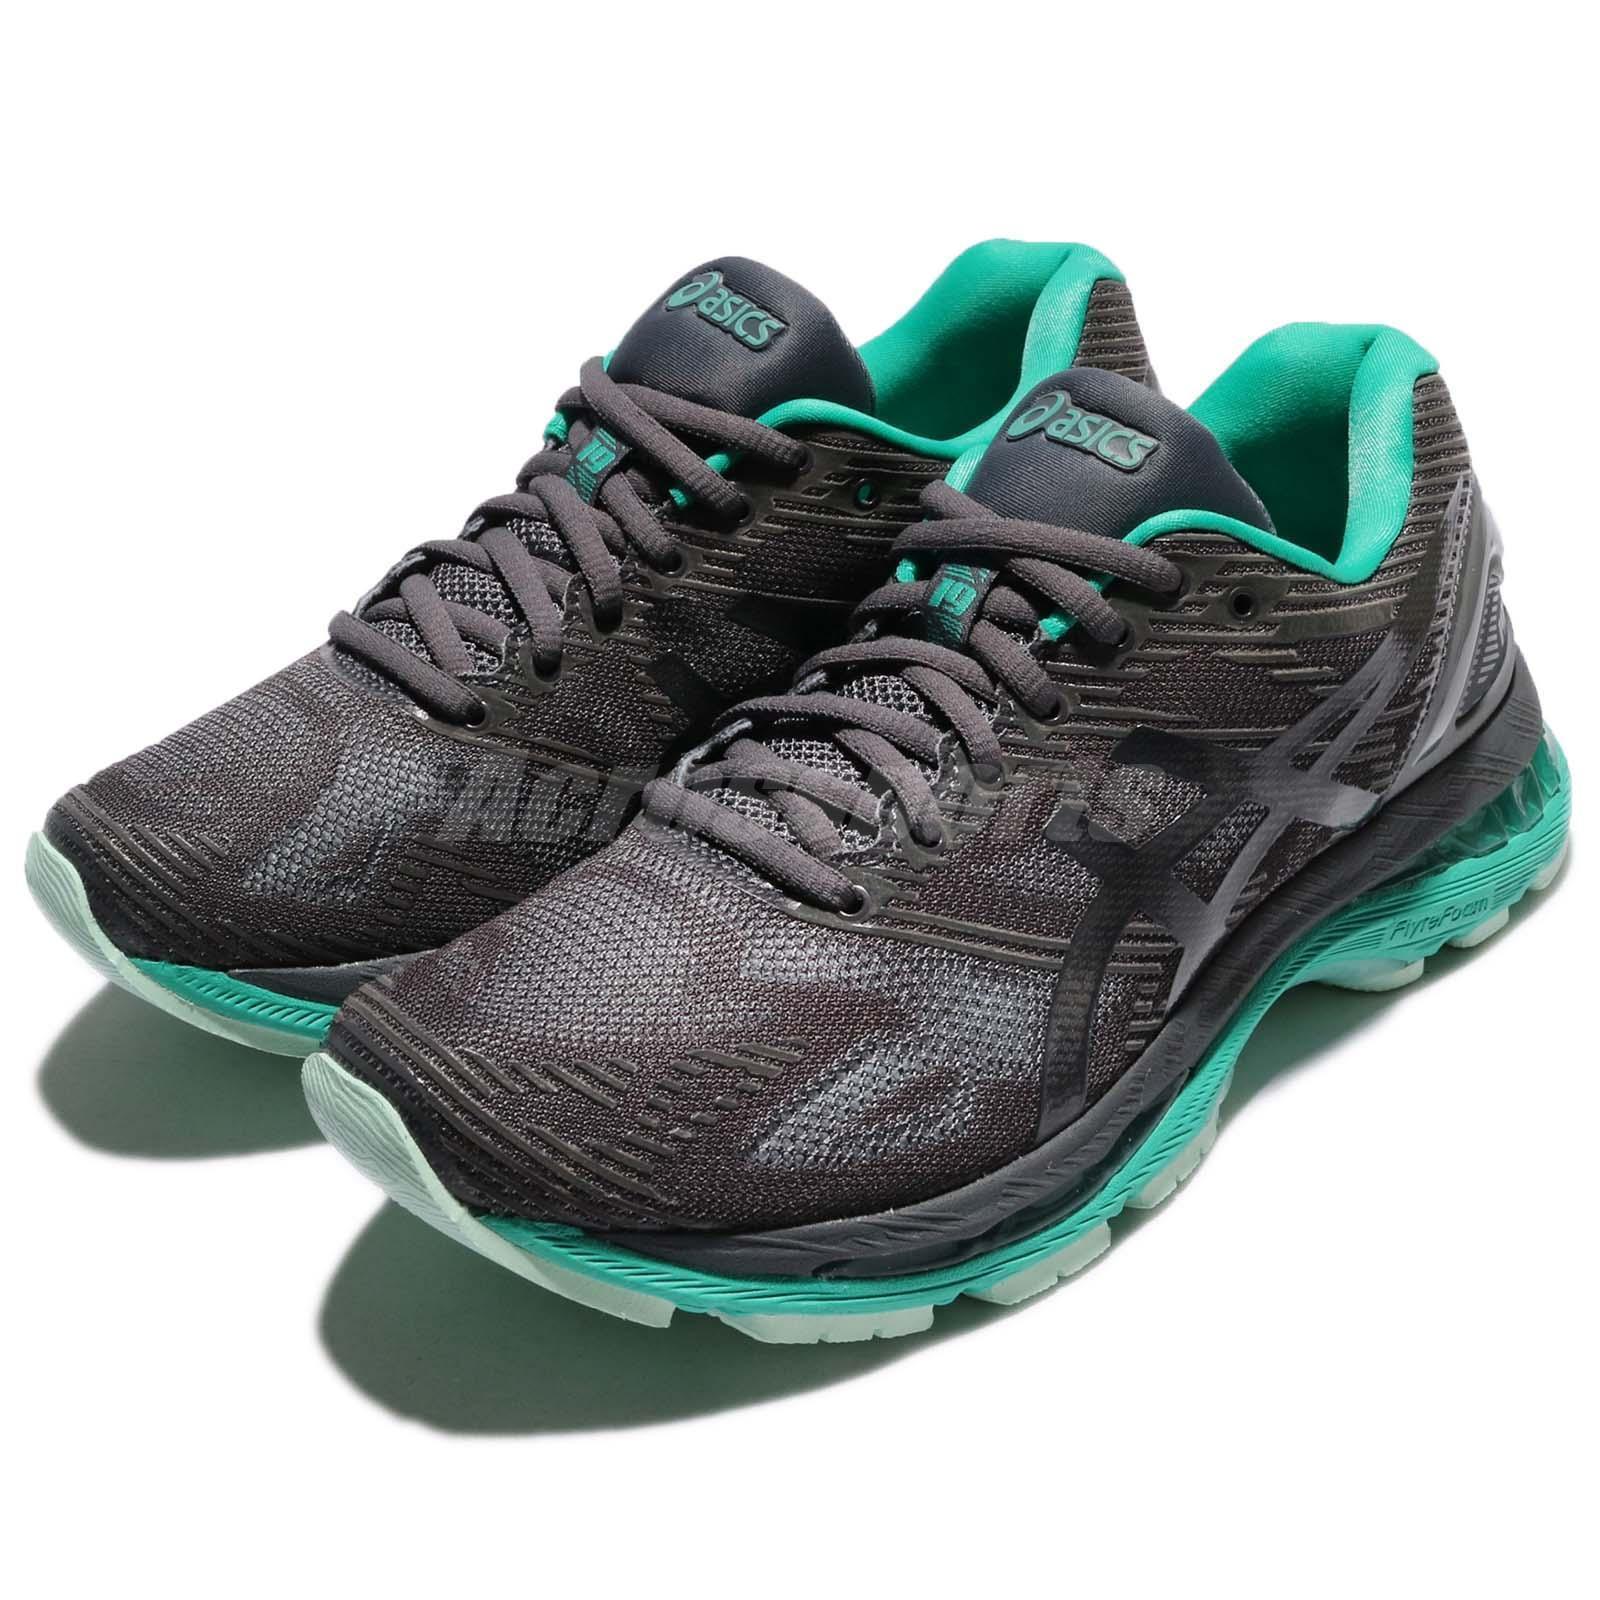 Asics Gel-Nimbus 19 Lite-Show Dark Grigio verde Donna Running Shoes T7C8N-9590